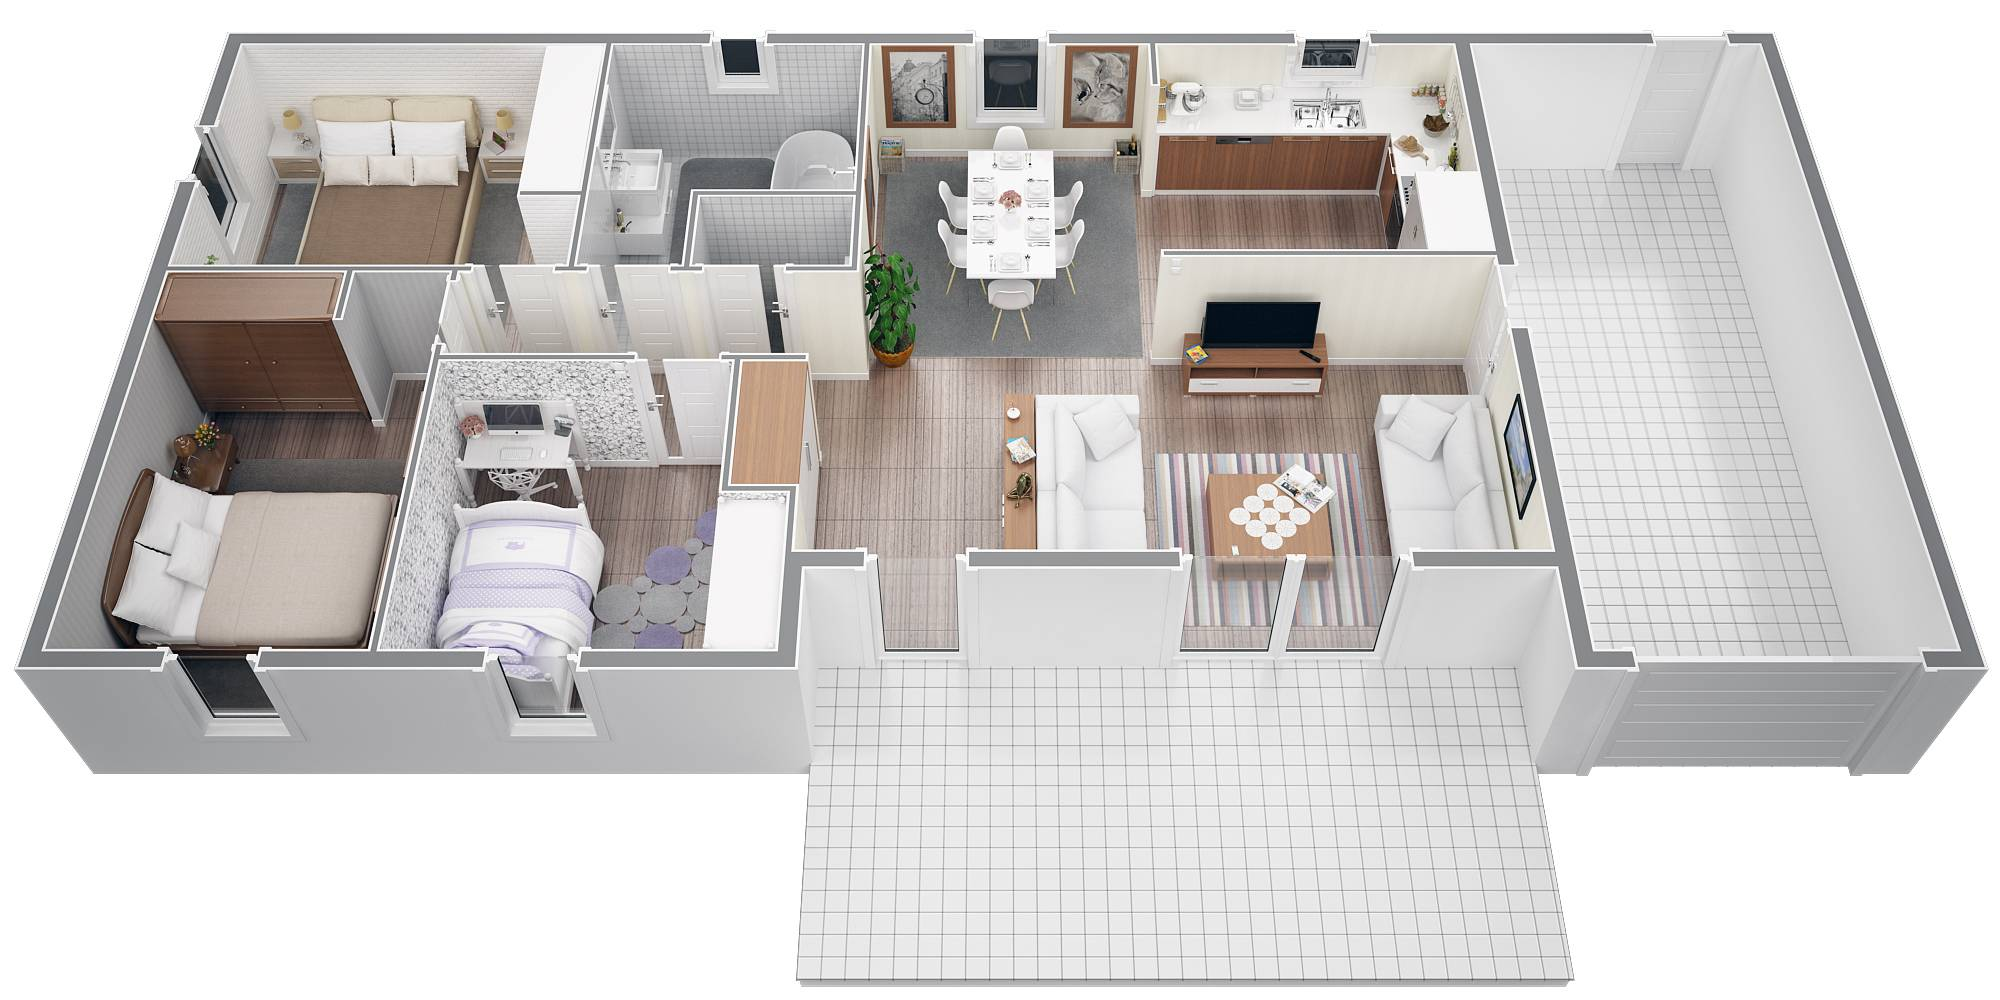 Plan maison moderne 100m2 - Menuiserie